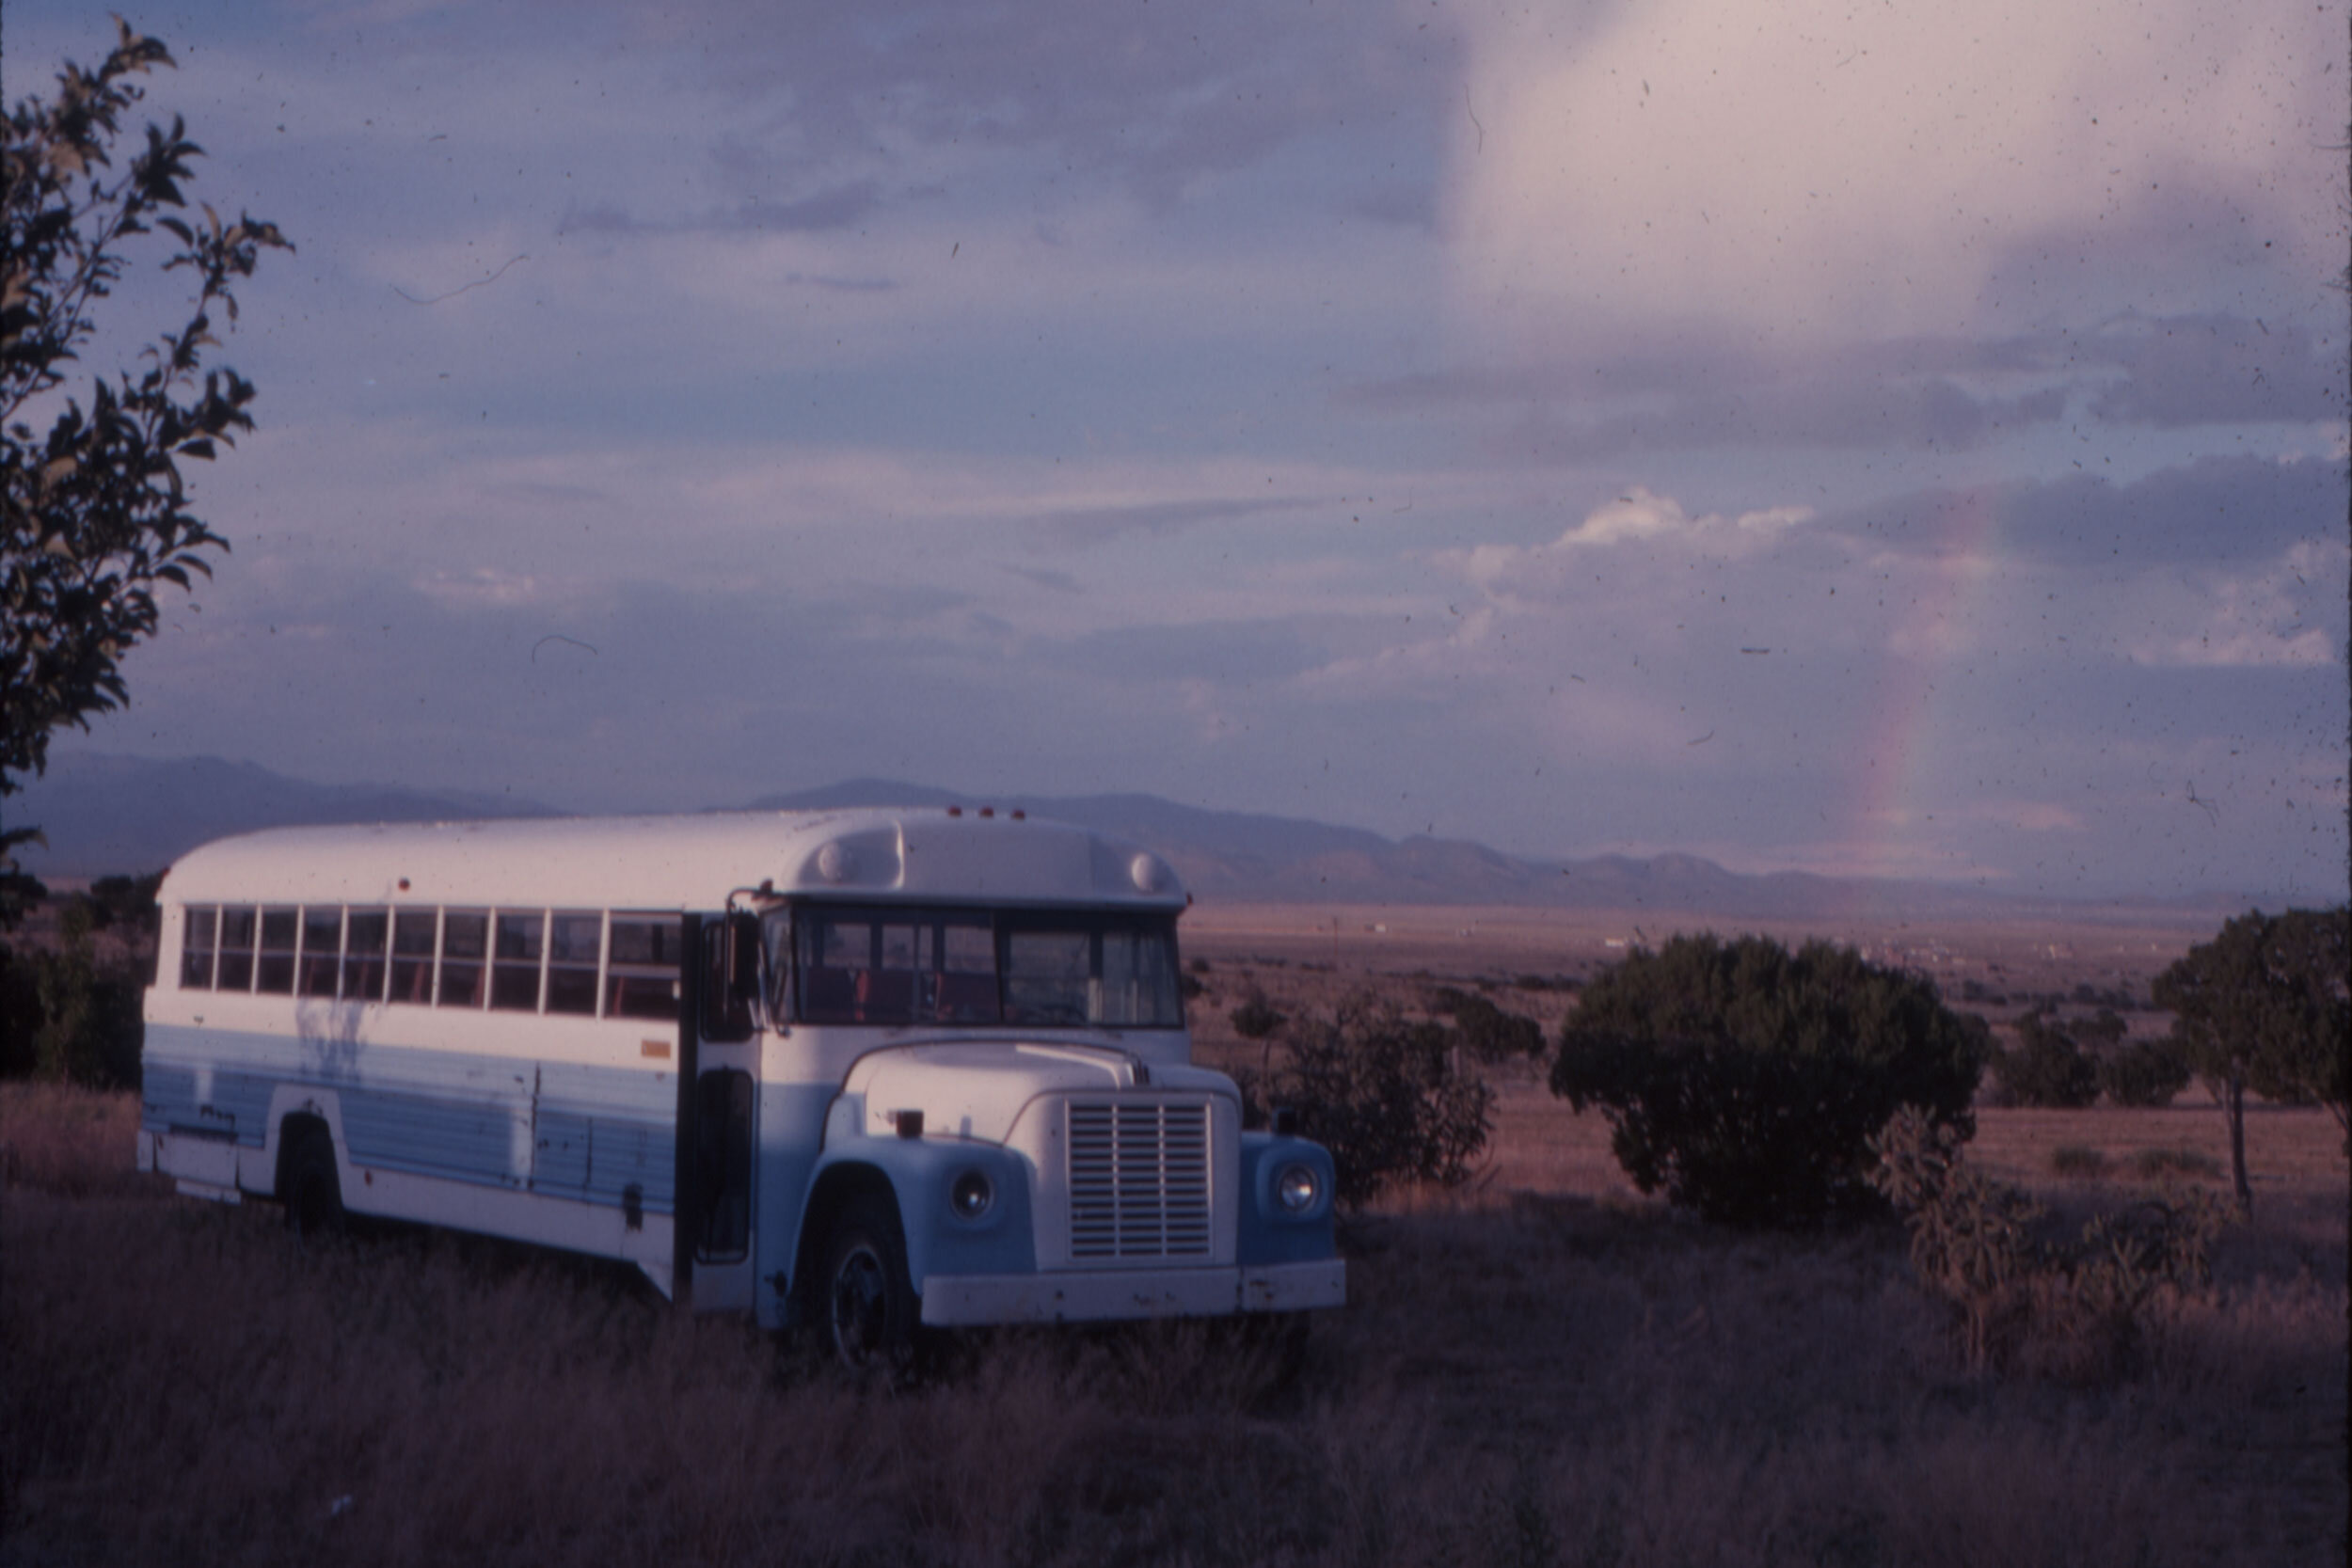 Synergist tour bus on Synergia Ranch